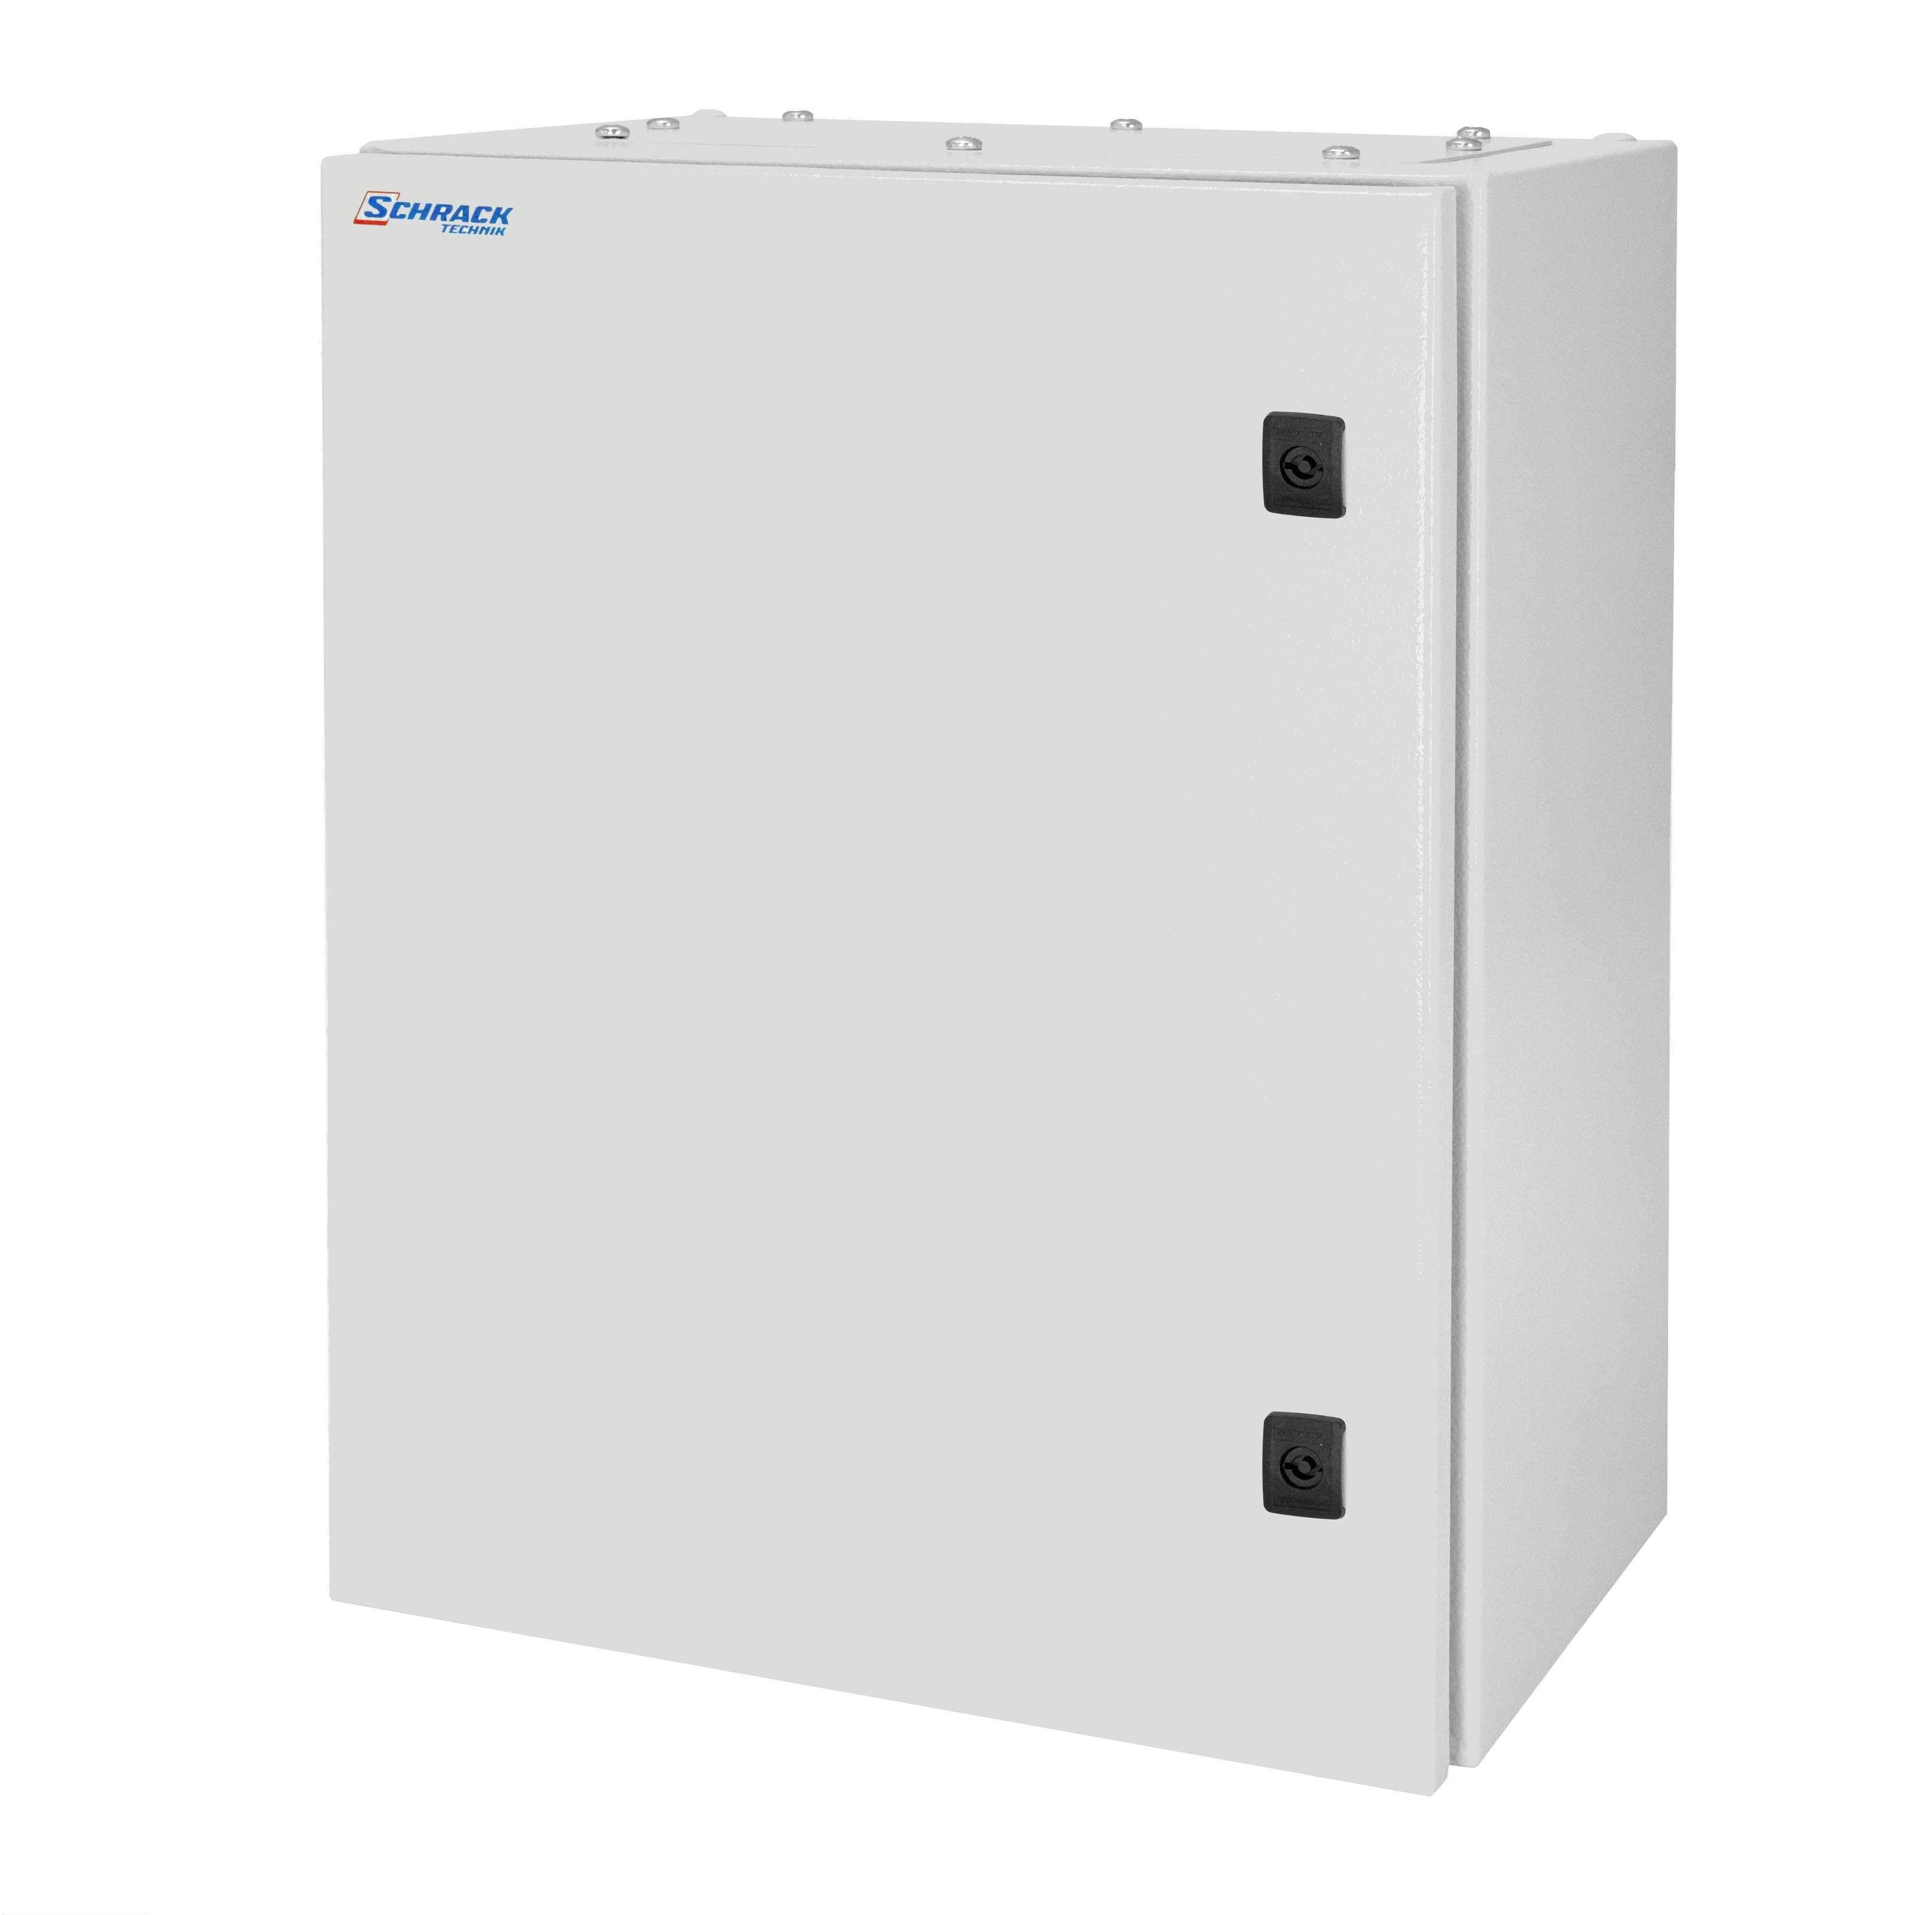 1 Stk Wandschrank Mono IP66 H=600 B=600 T=300 Stahlblech WSM6060300